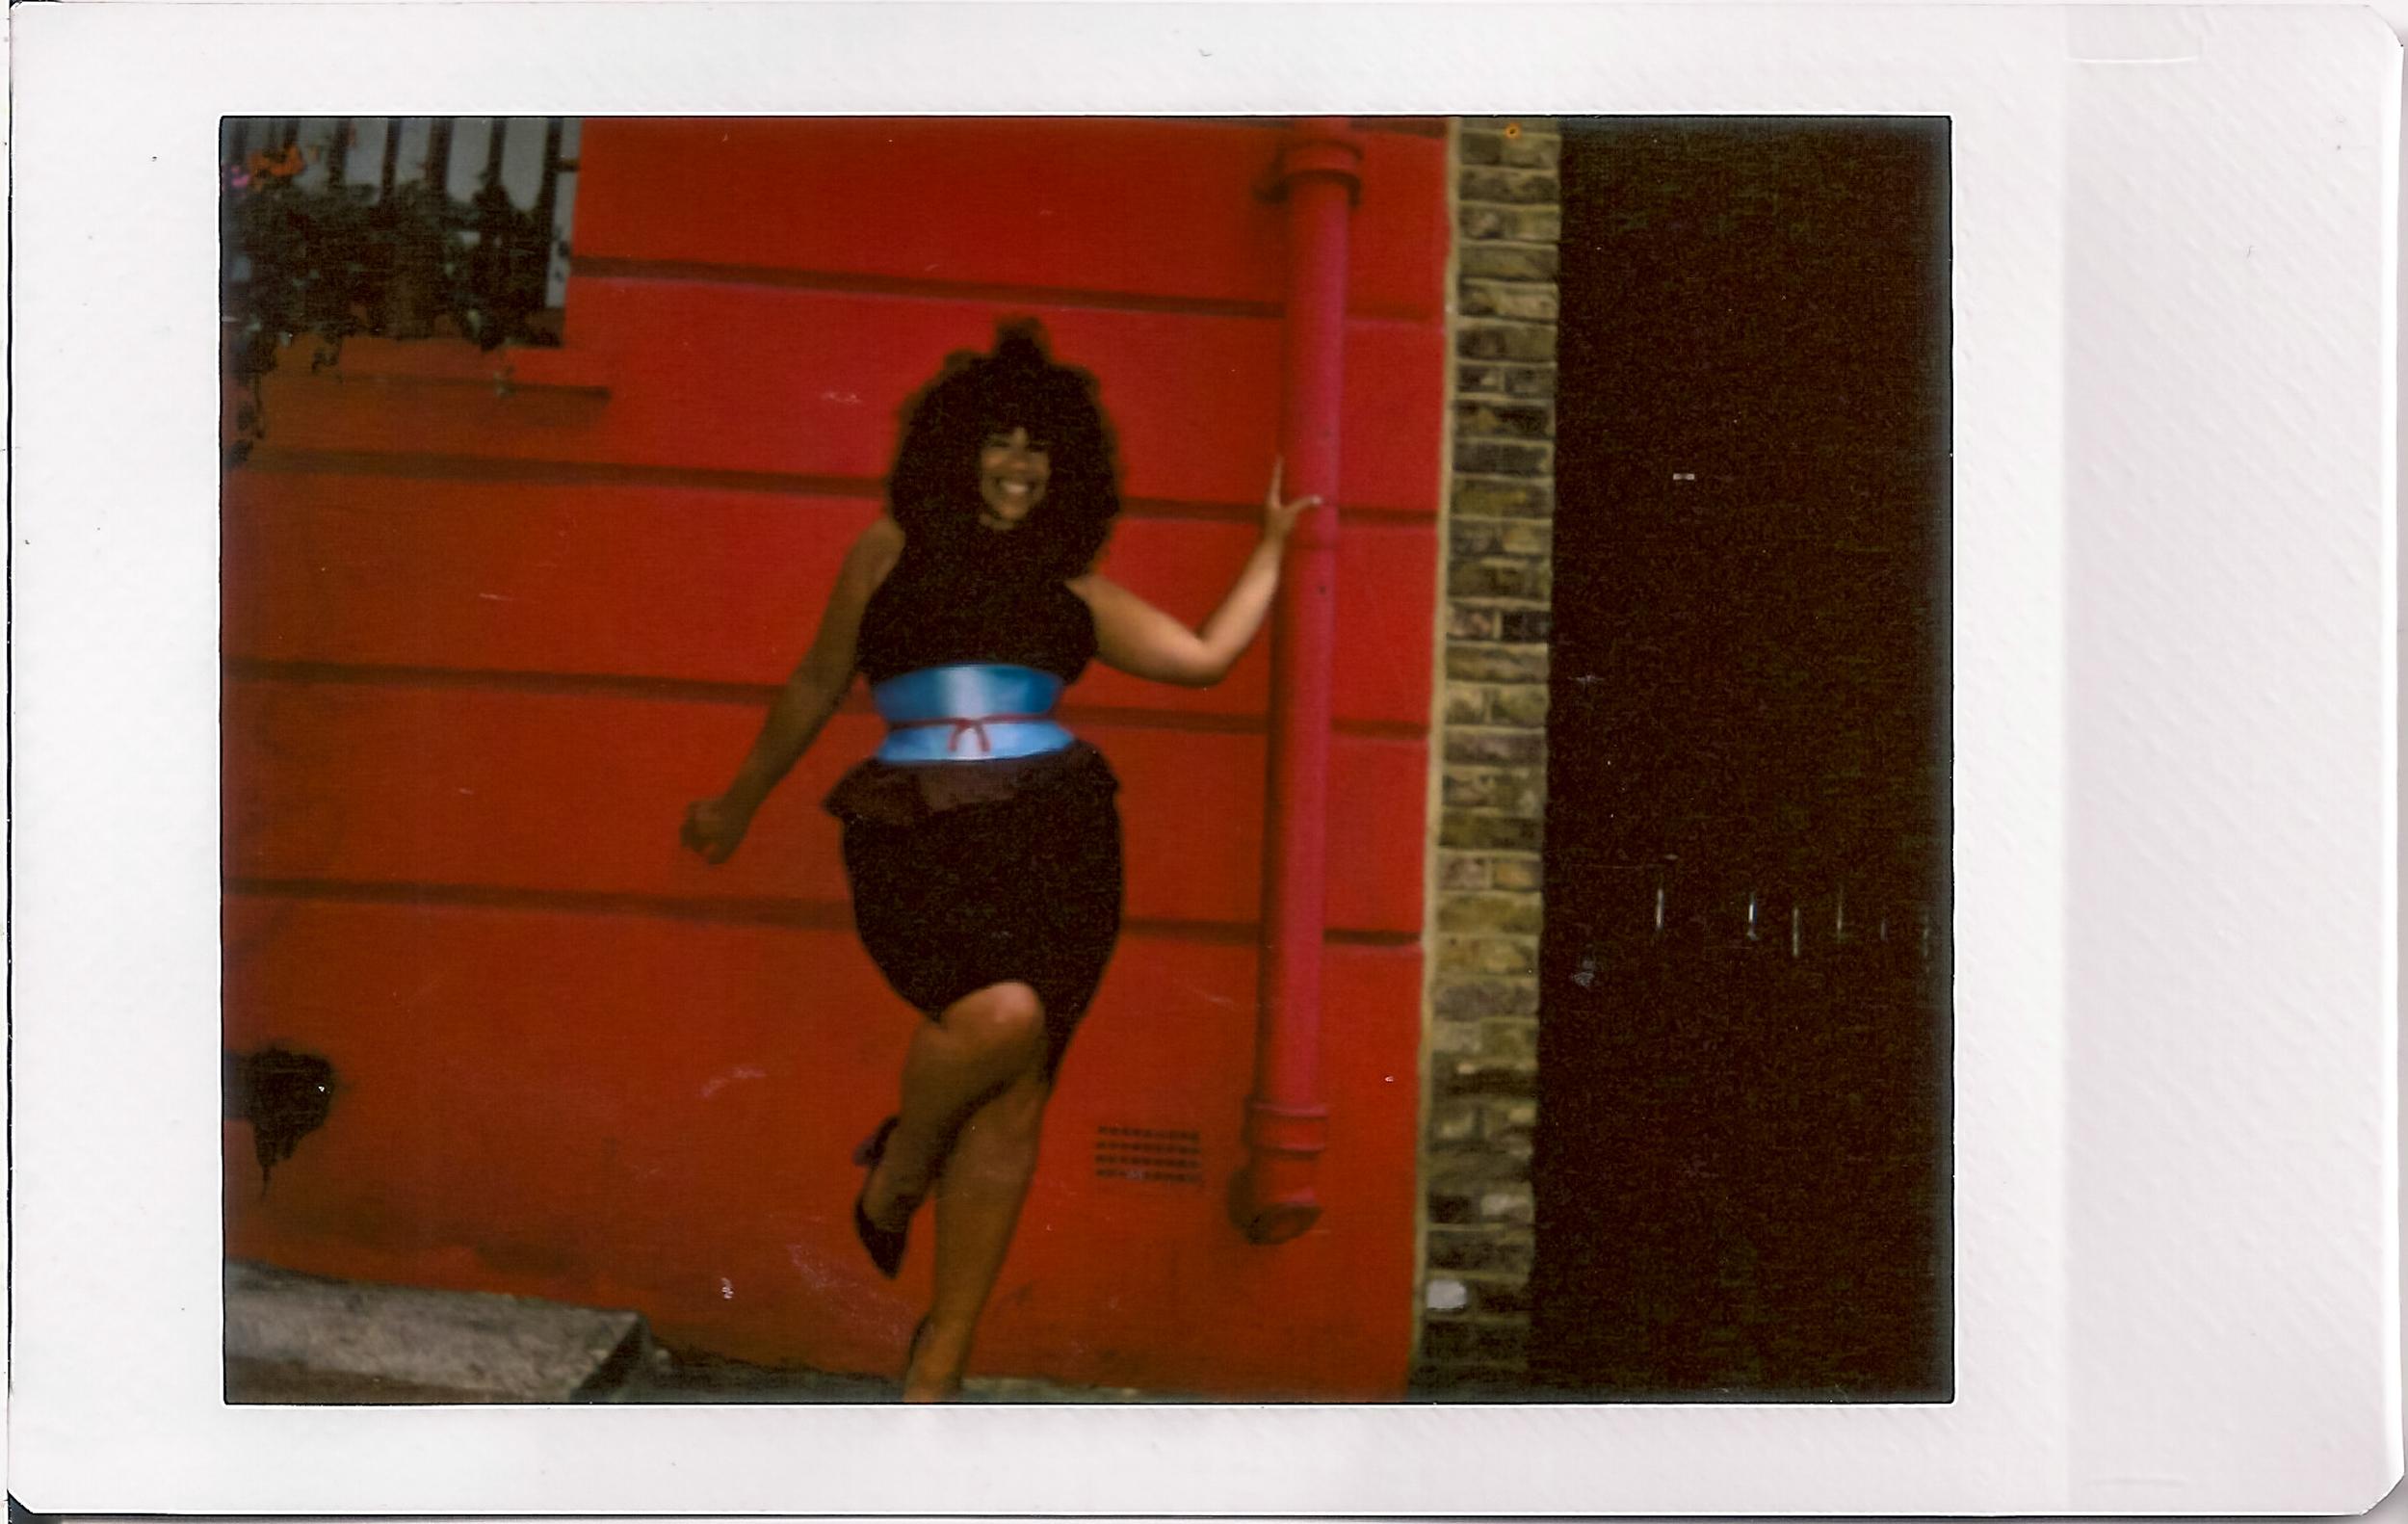 Olivia Campbell bombshell 7 polaroid edit.jpg